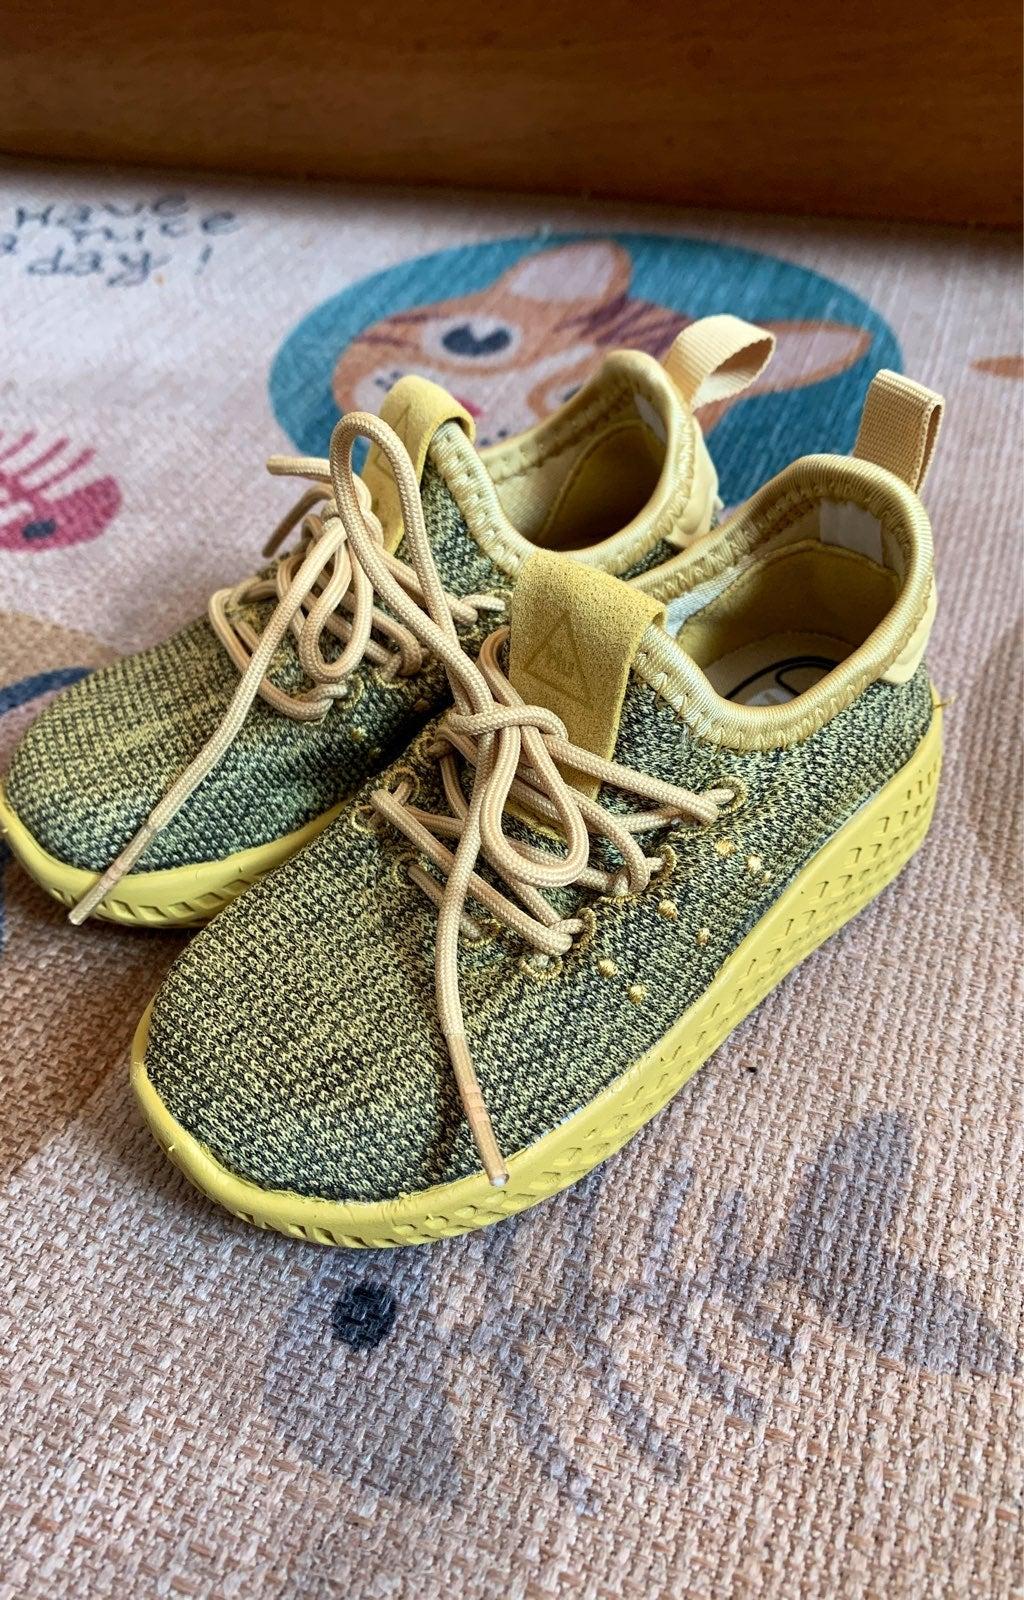 Adidas pharrell williams toddler shoes 5